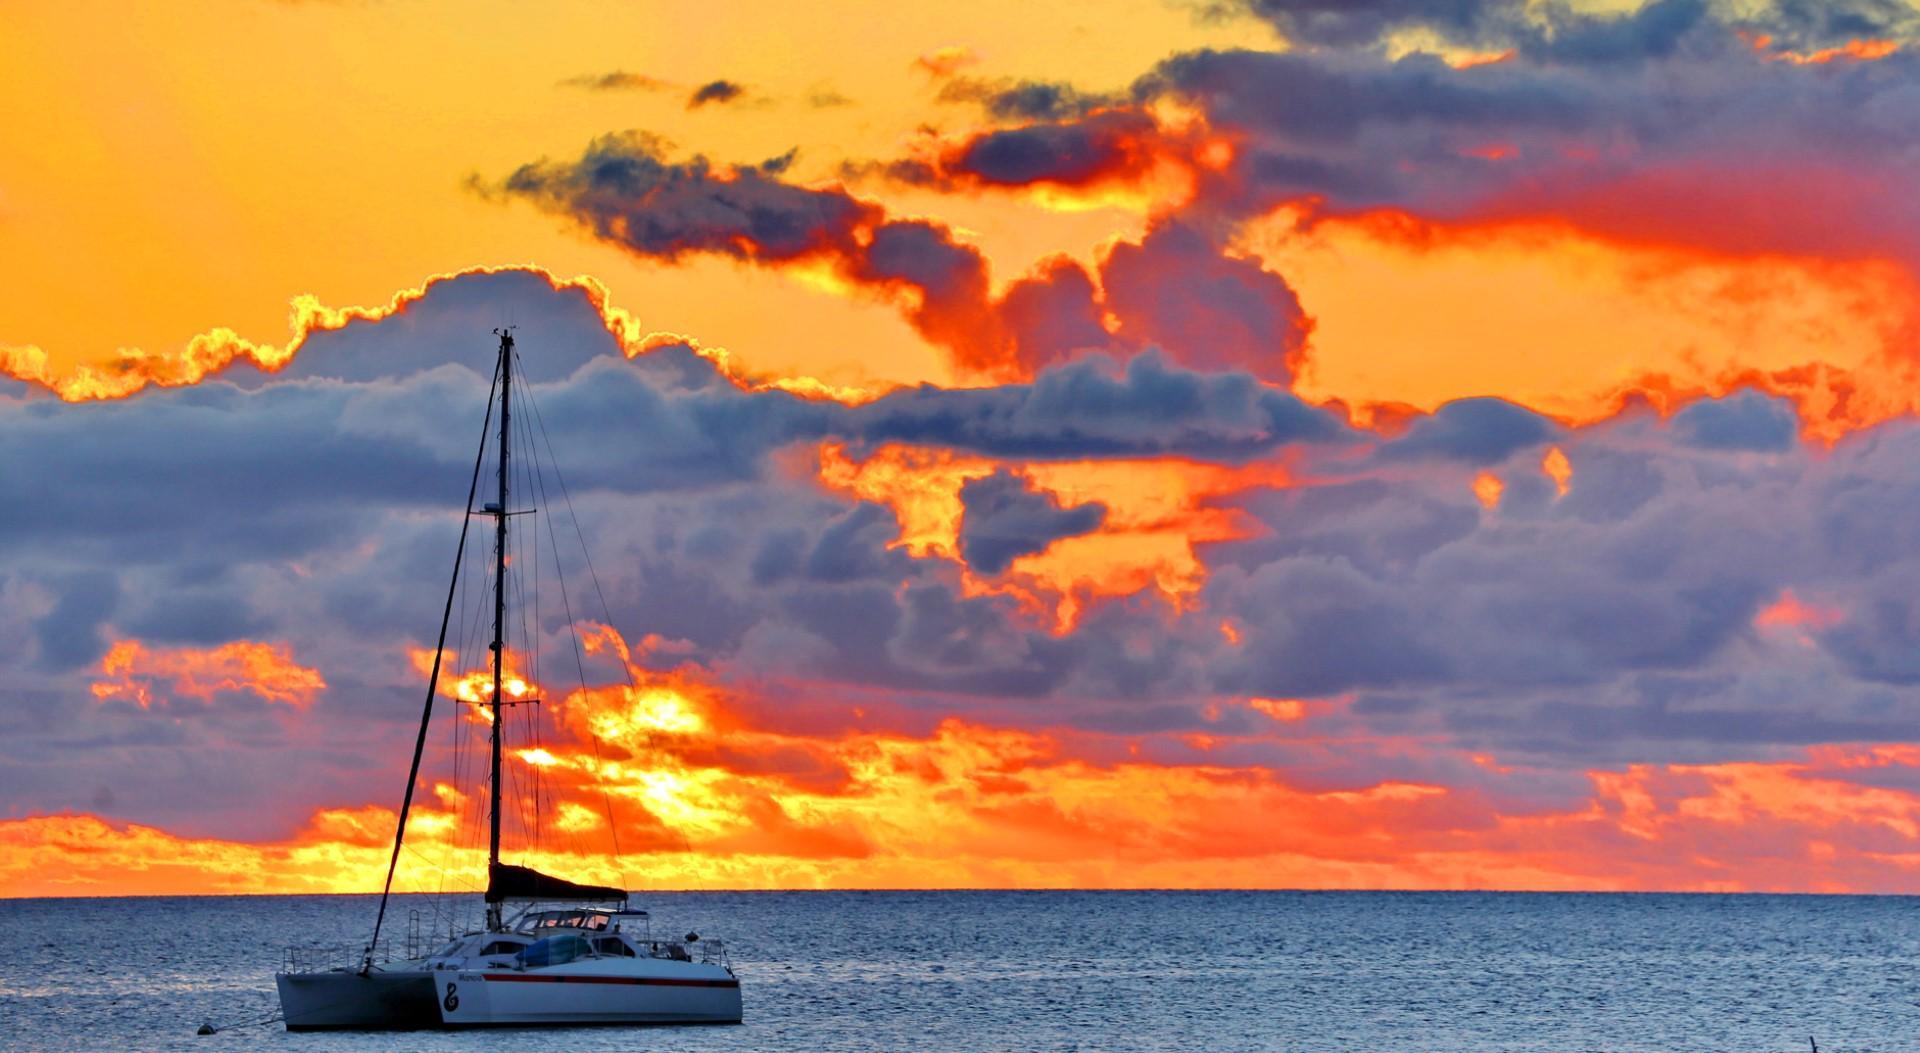 Donnavventura in Nuova Caledonia: Ouvèa, Lifou e Marè